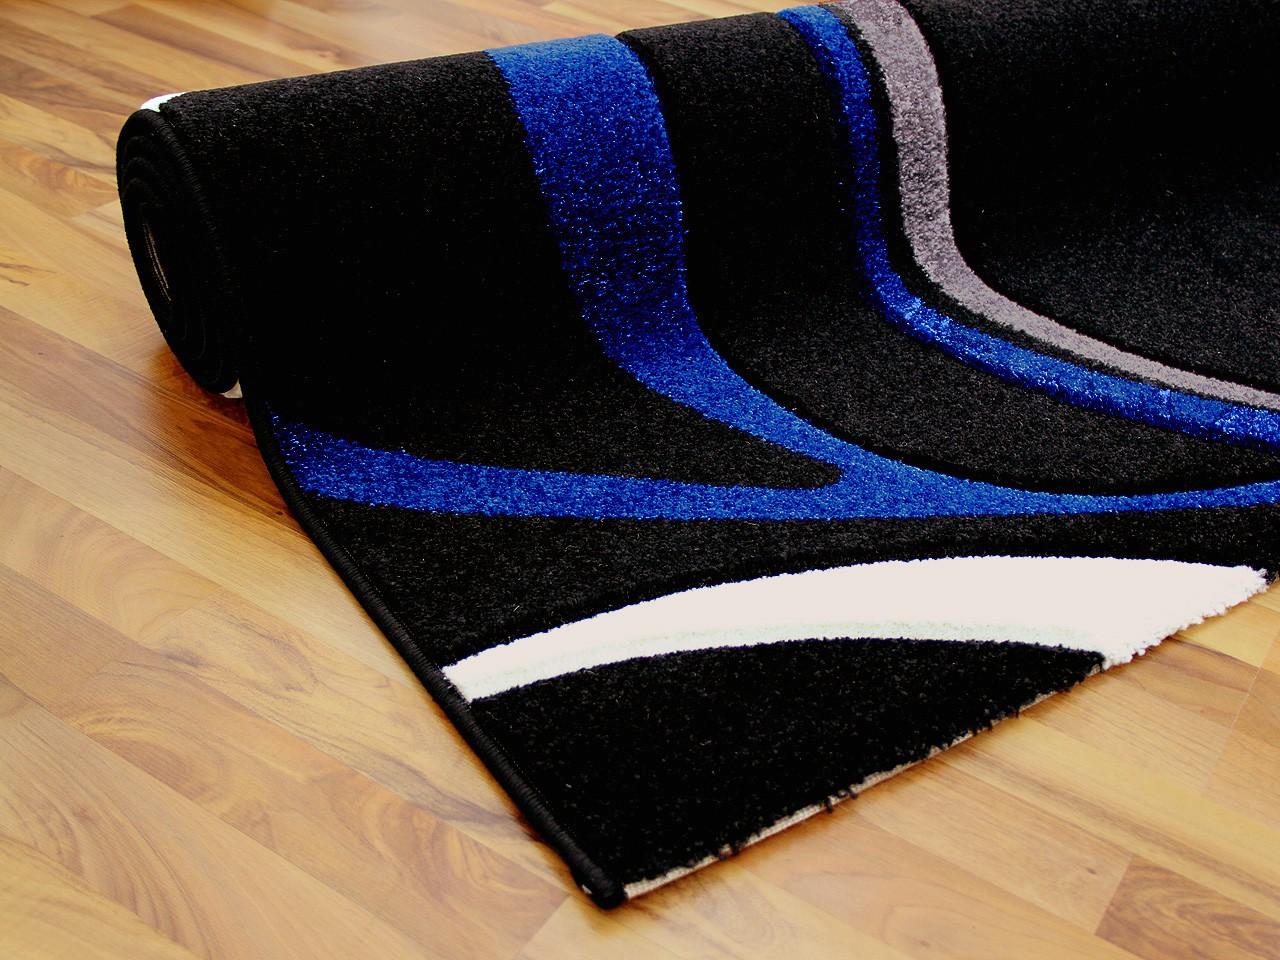 designer teppich maui schwarz blau style teppiche designerteppiche maui teppiche. Black Bedroom Furniture Sets. Home Design Ideas